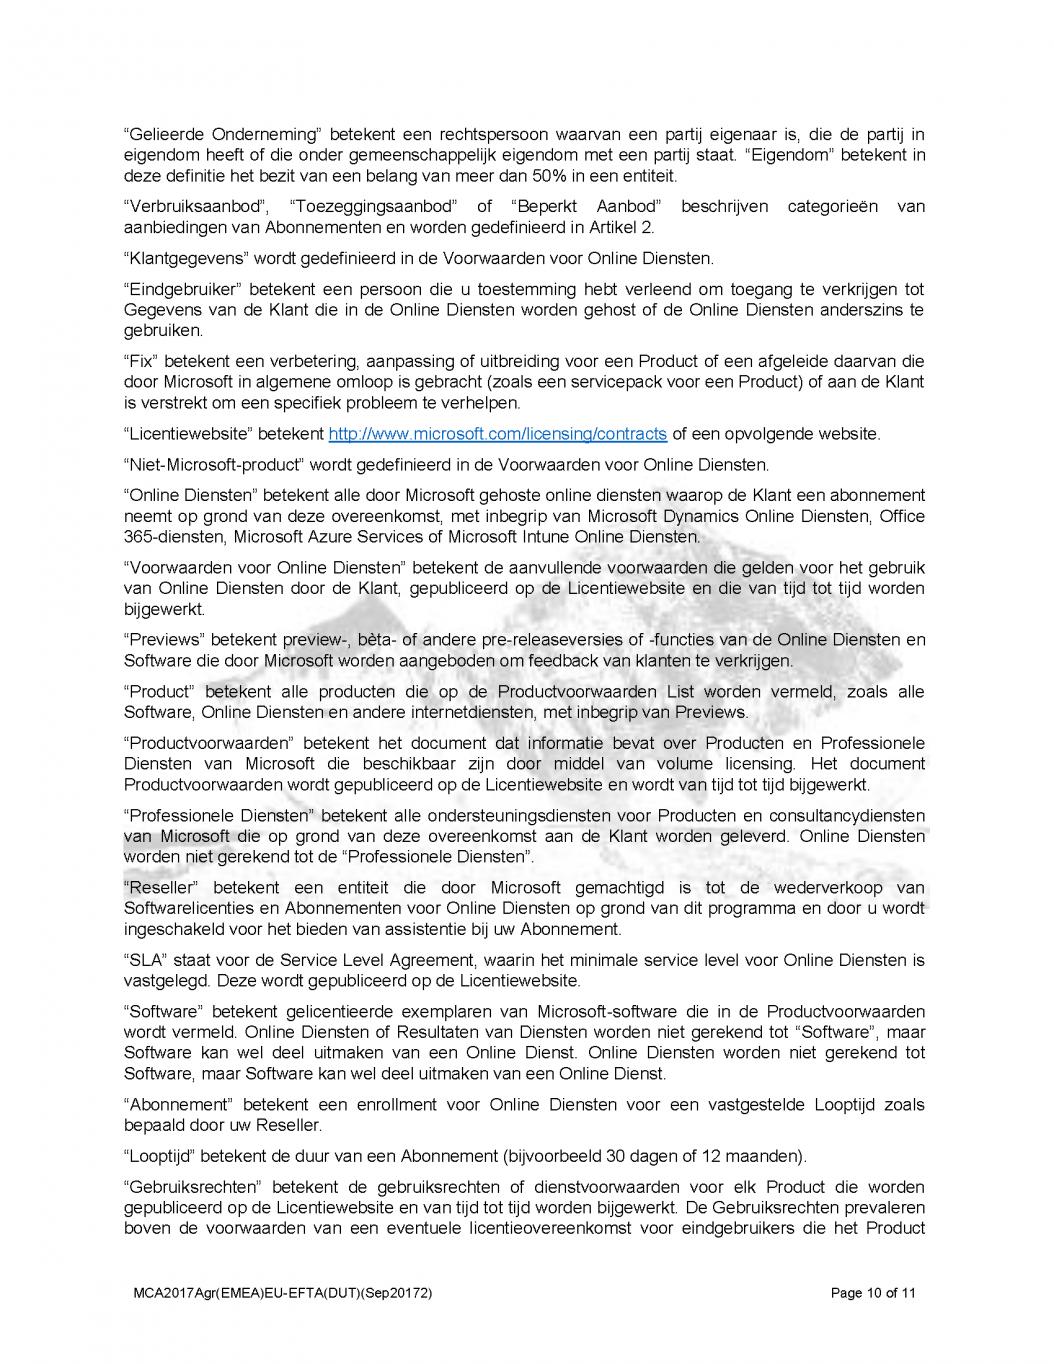 Microsoft MCA 2017 Dutch_Page_10.png